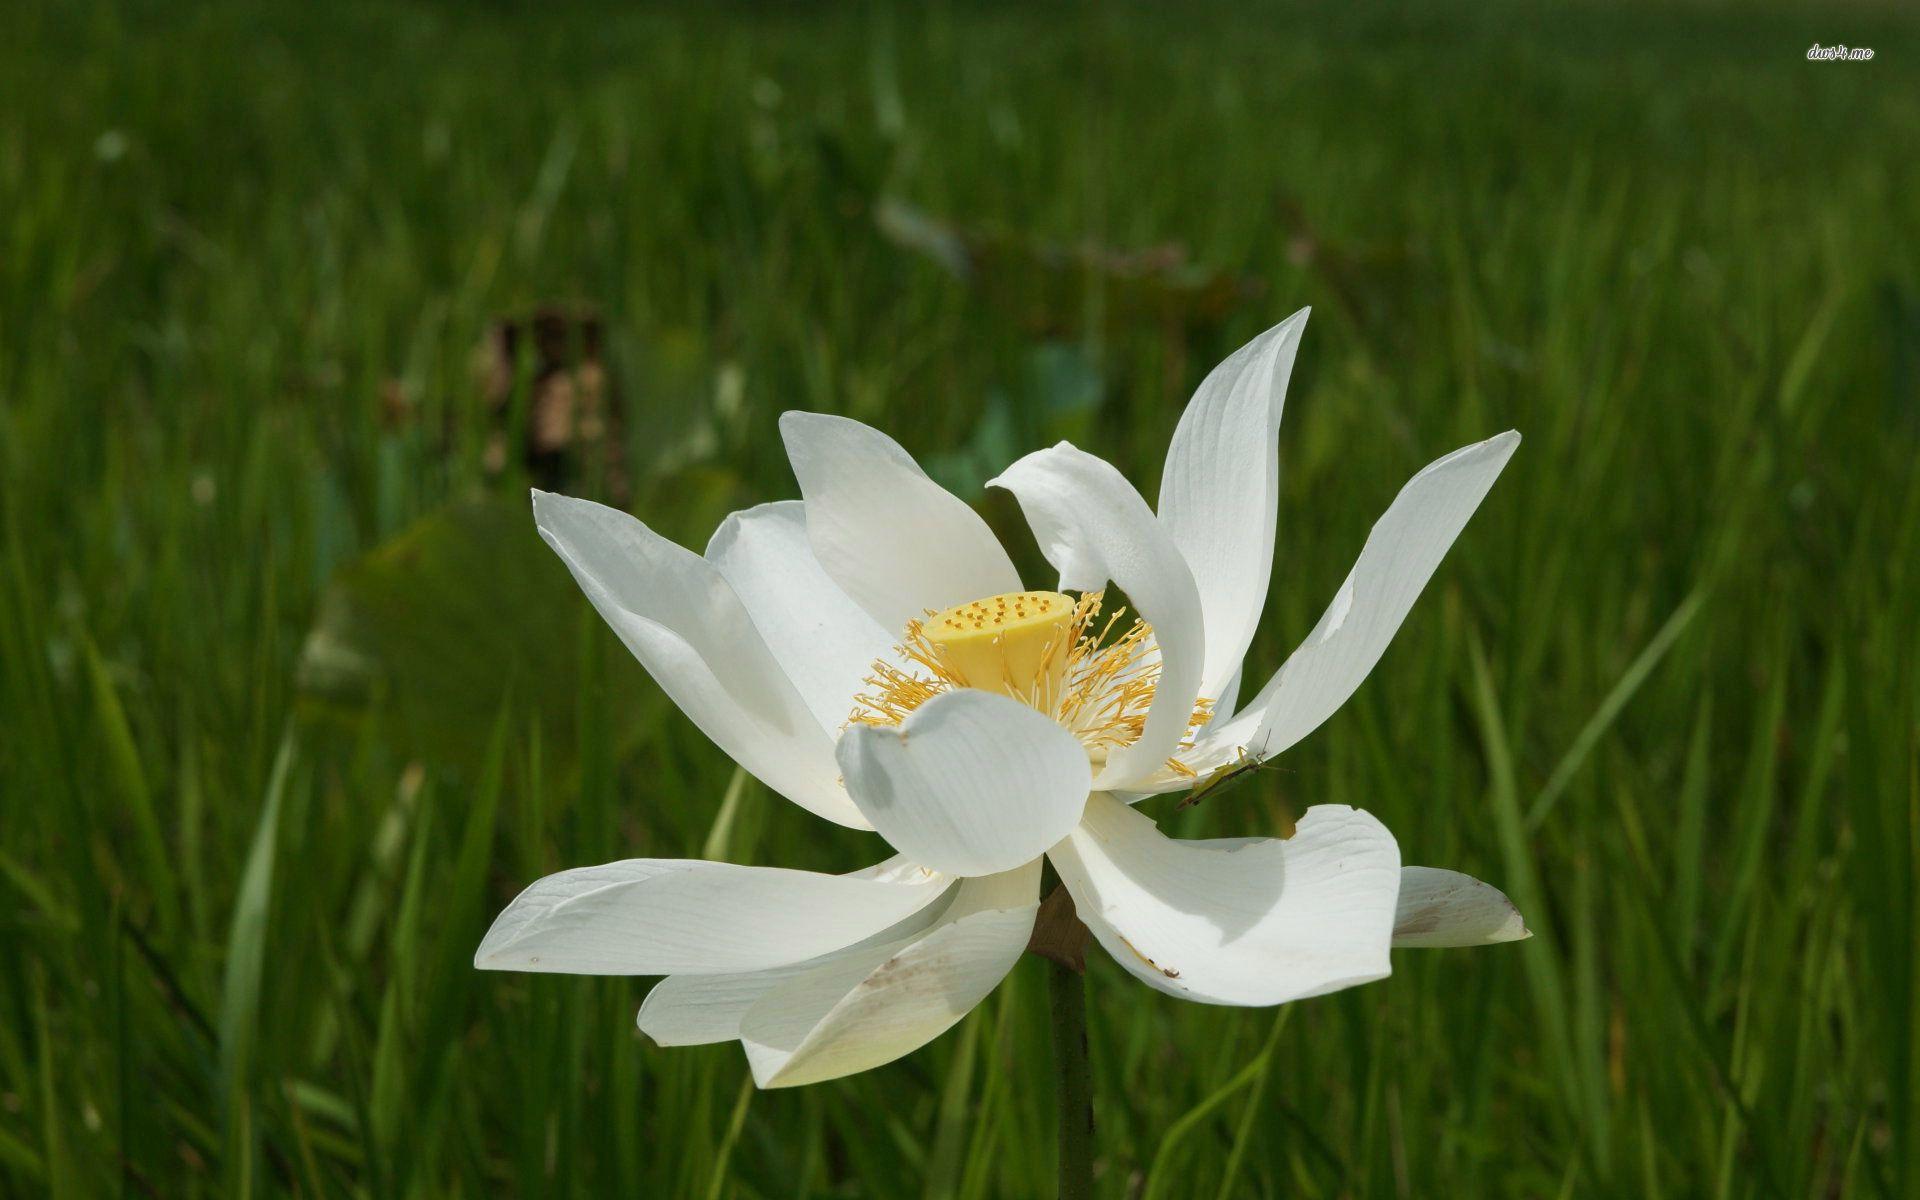 White Lotus Flower Hd Wallpaper Flower Wallpaper Lotus Wallpaper